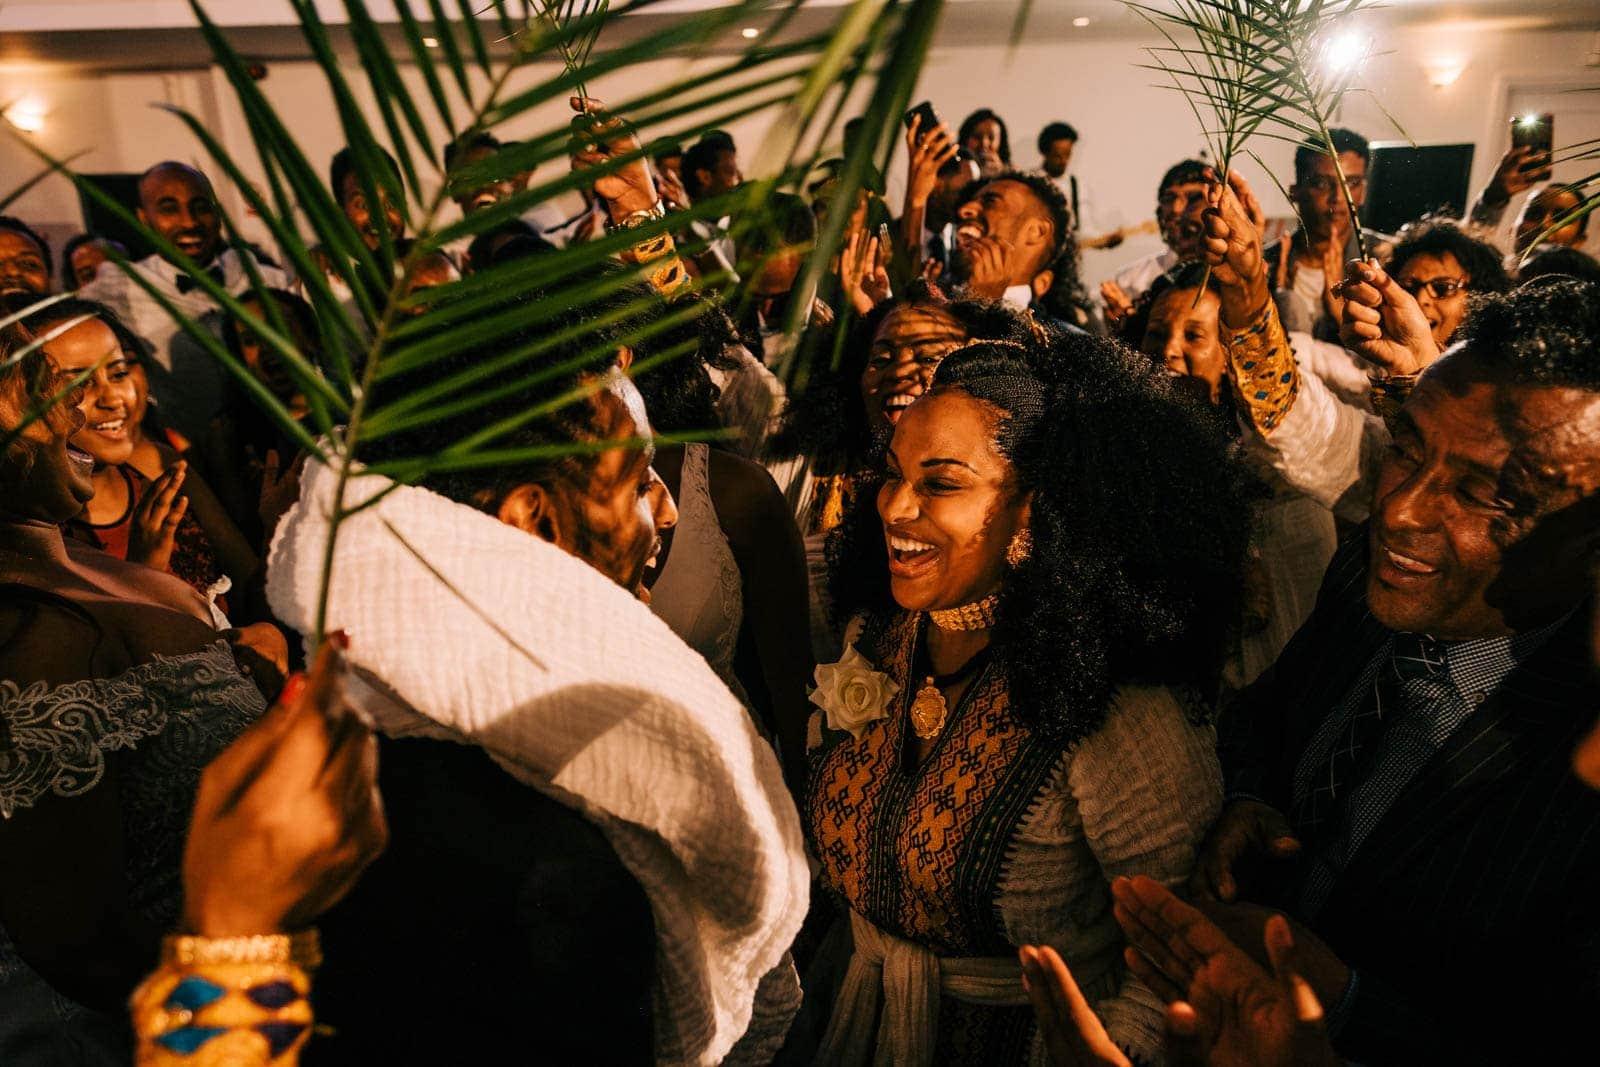 Epic Ethiopian dancing